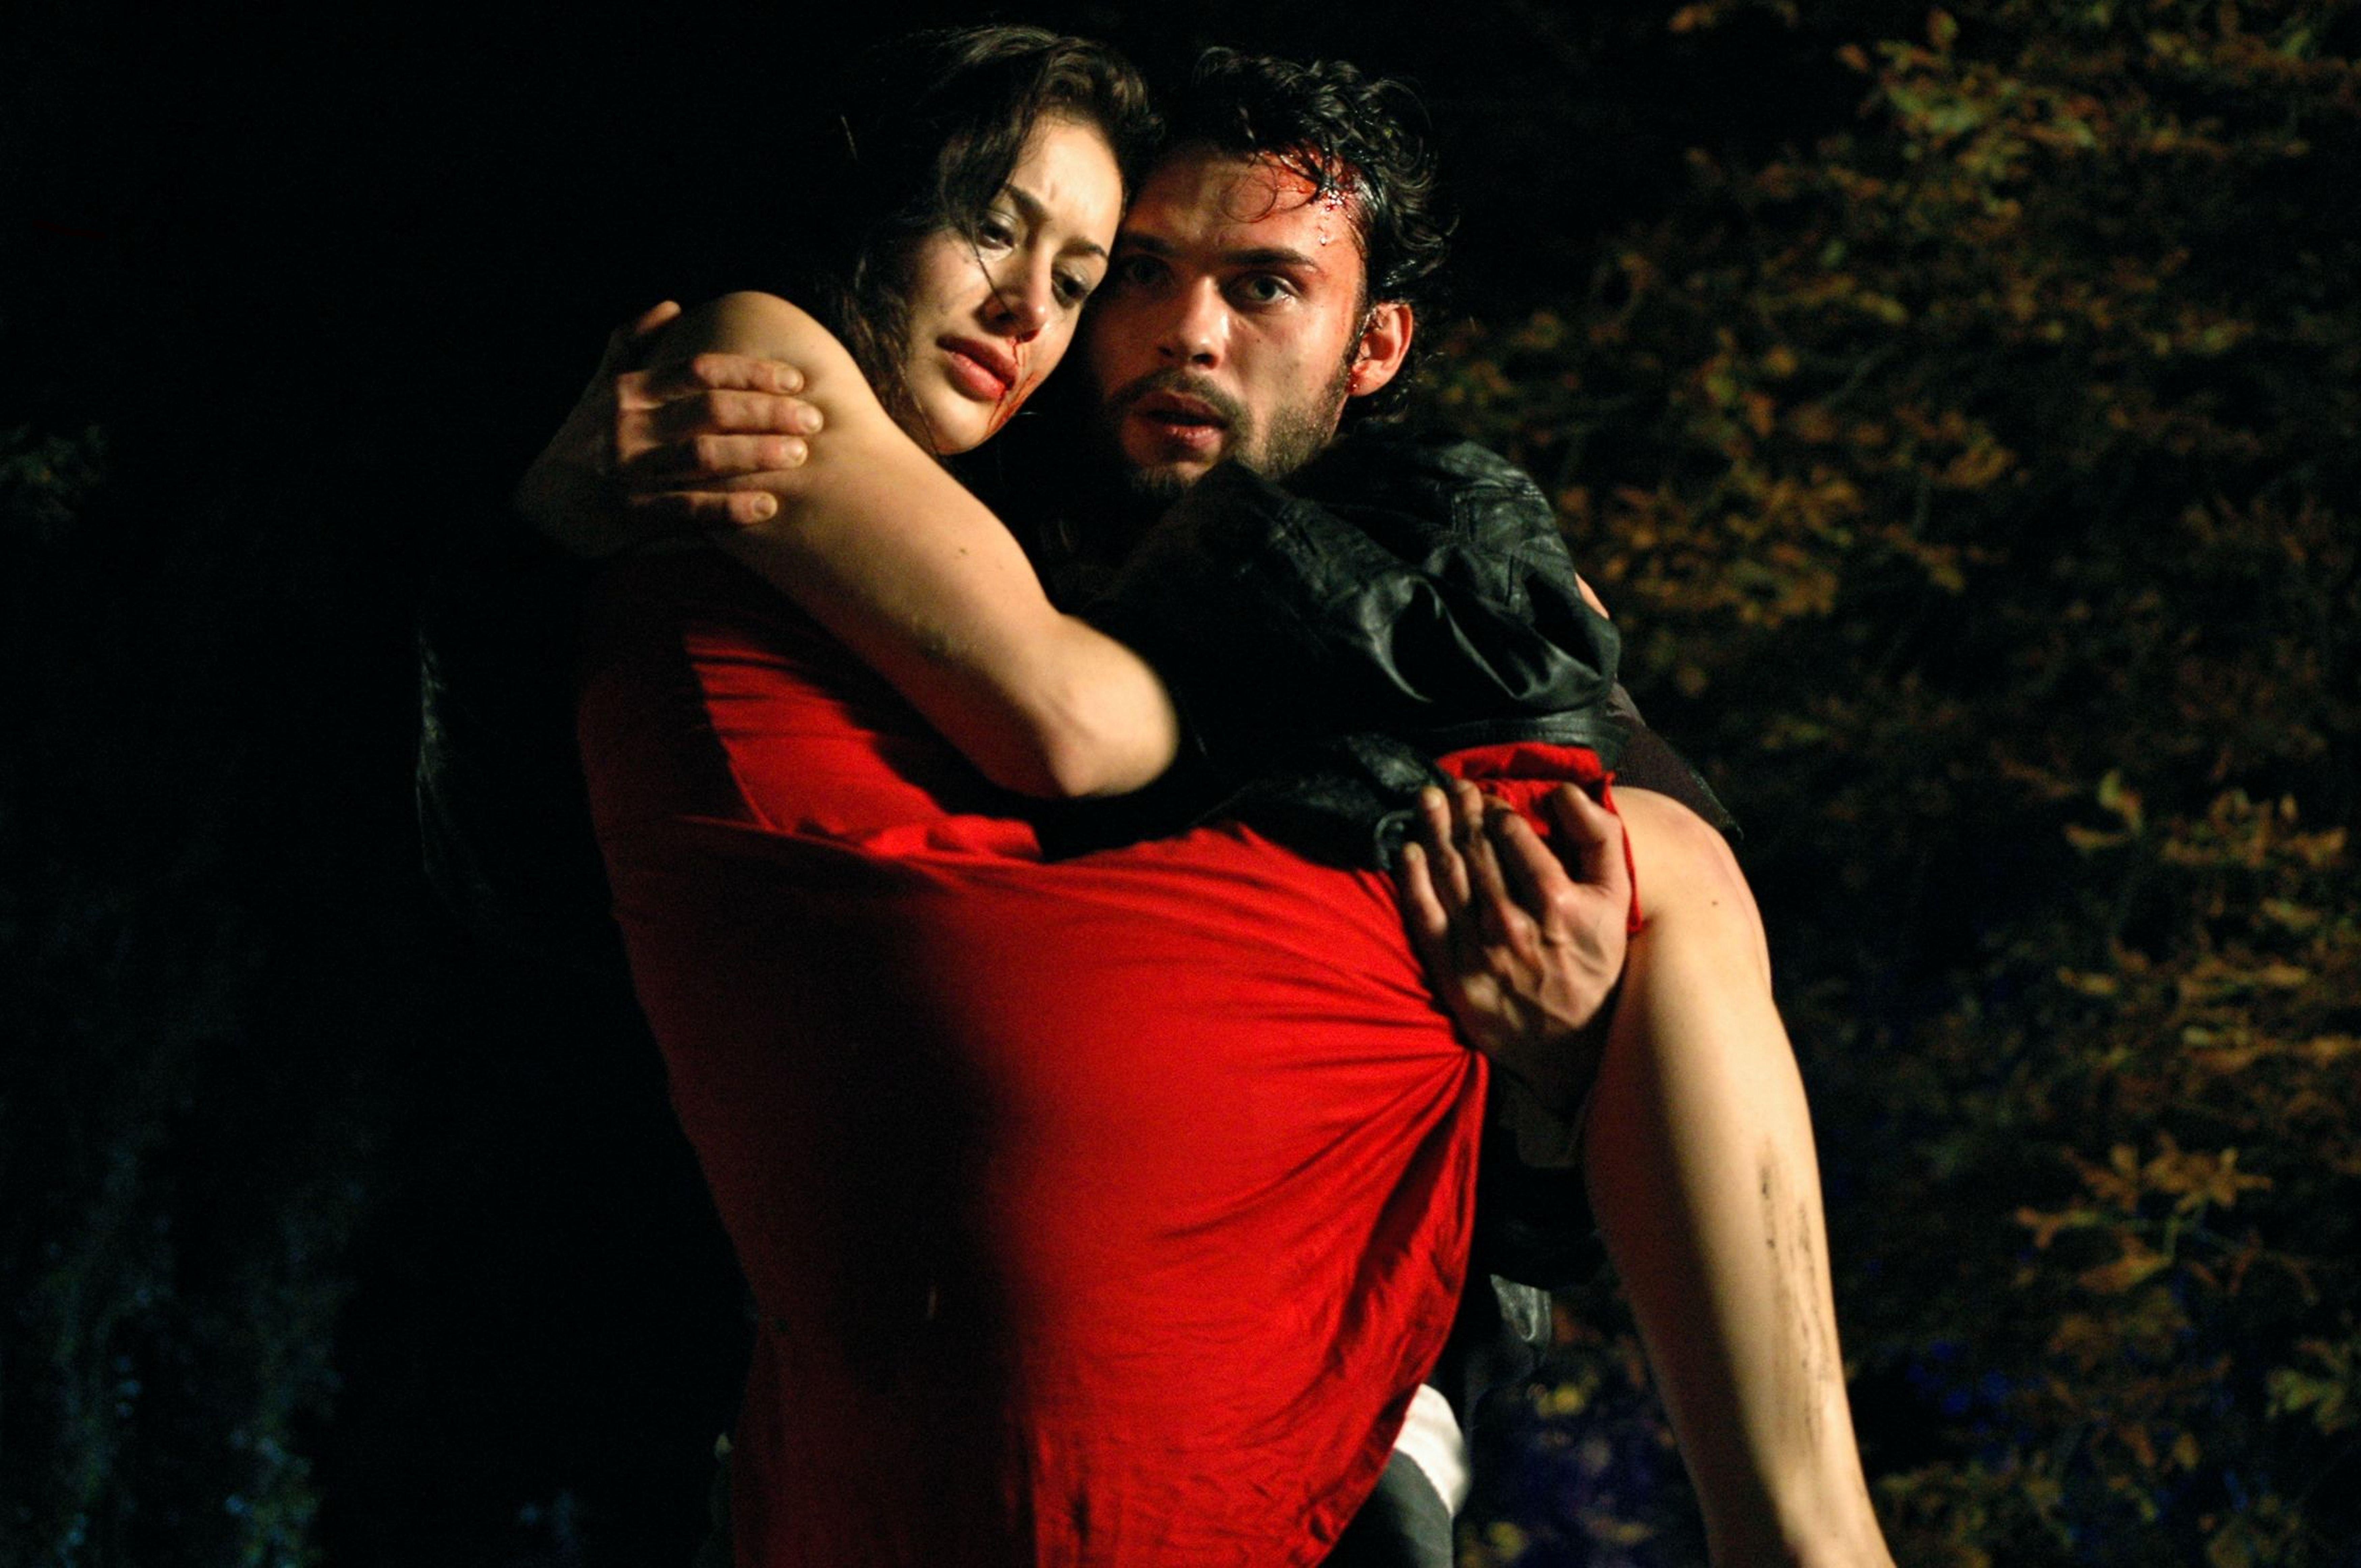 Robinson Stévenin and Fanny Valette in Sur ta joue ennemie (2008)